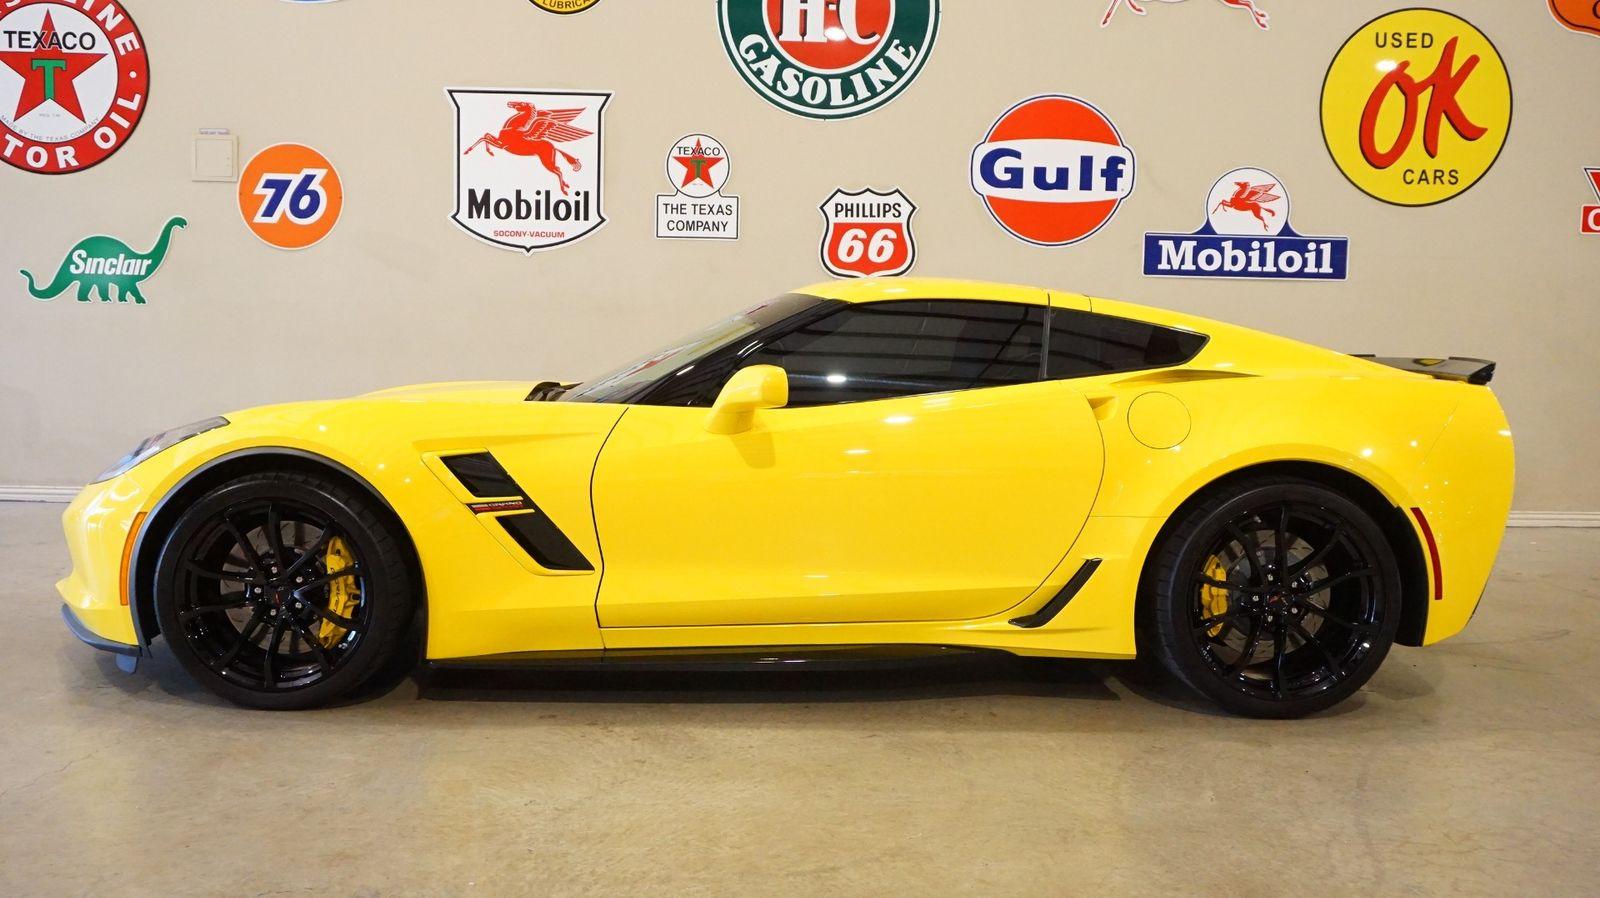 2017 Yellow Chevrolet Corvette Grand Sport 1LT | C7 Corvette Photo 3